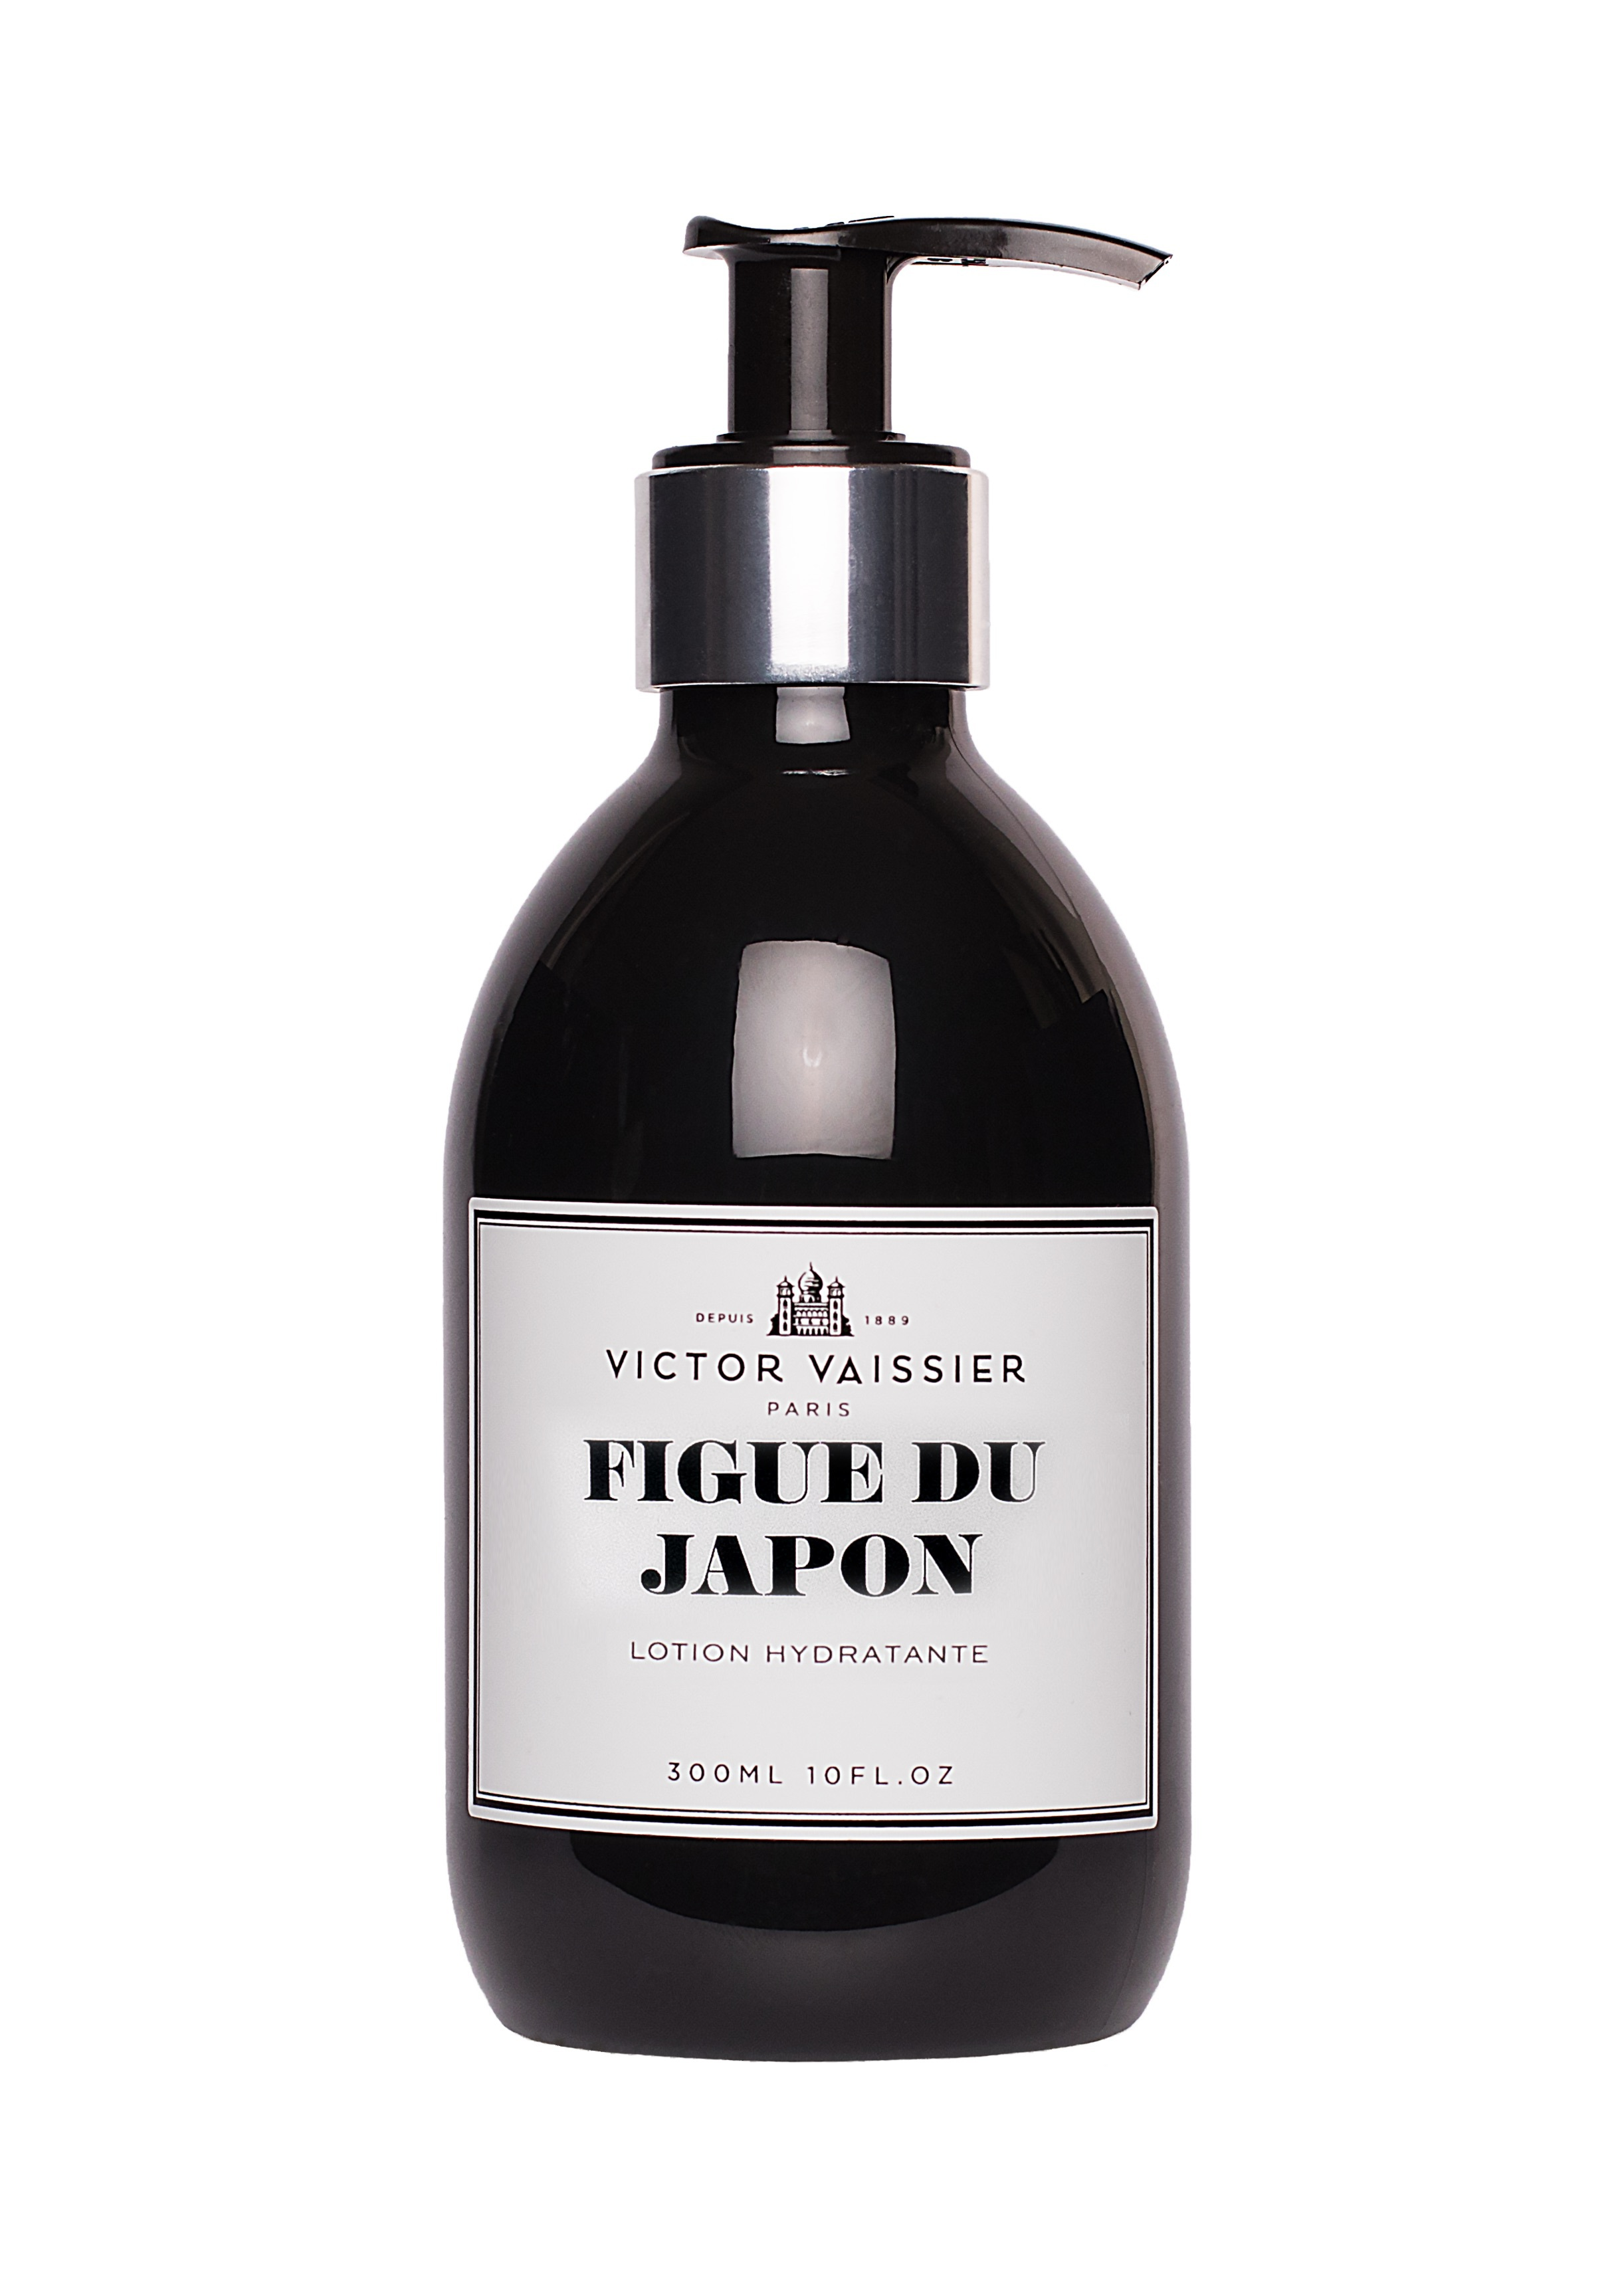 Figue du Japon Hydrating Lotion 300ml